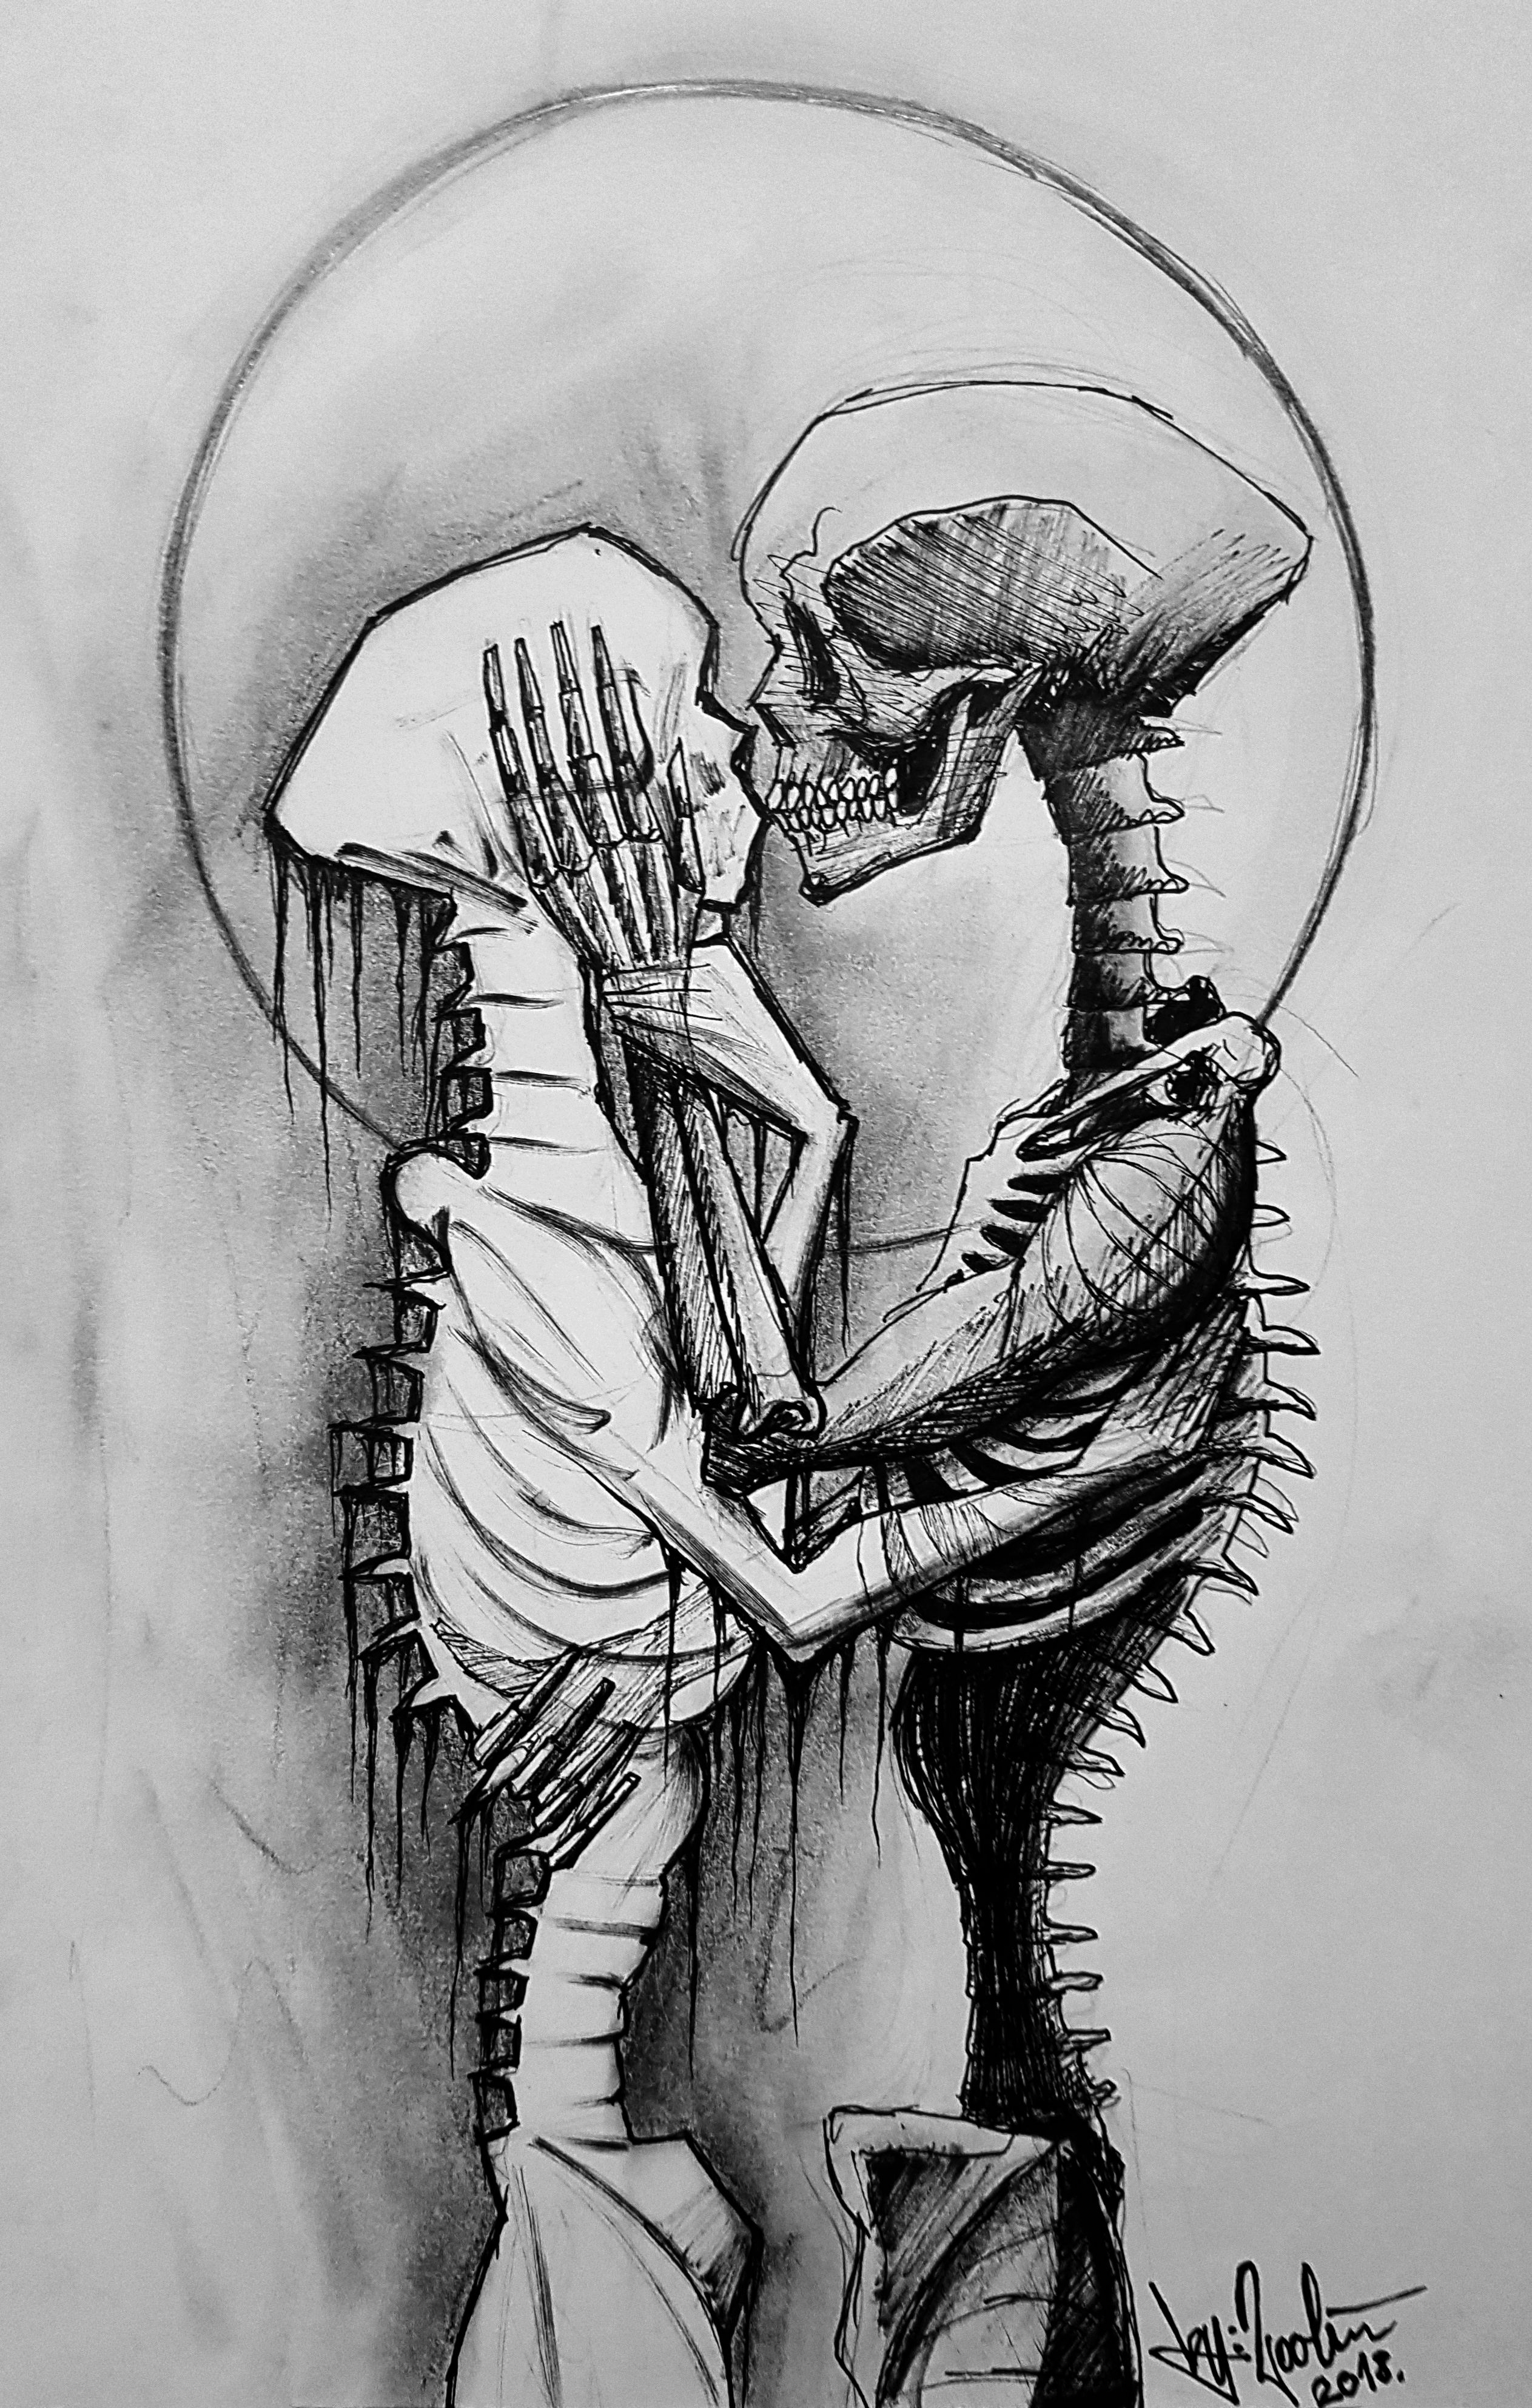 04aa4bc096 LOST LOVE // ELVESZETT SZERELEM #art #artist #dark #black #skeleton  #feelings #badtrip #under #the #skin #undertheskin #byrooli #kelemenstyle  #mystyle ...